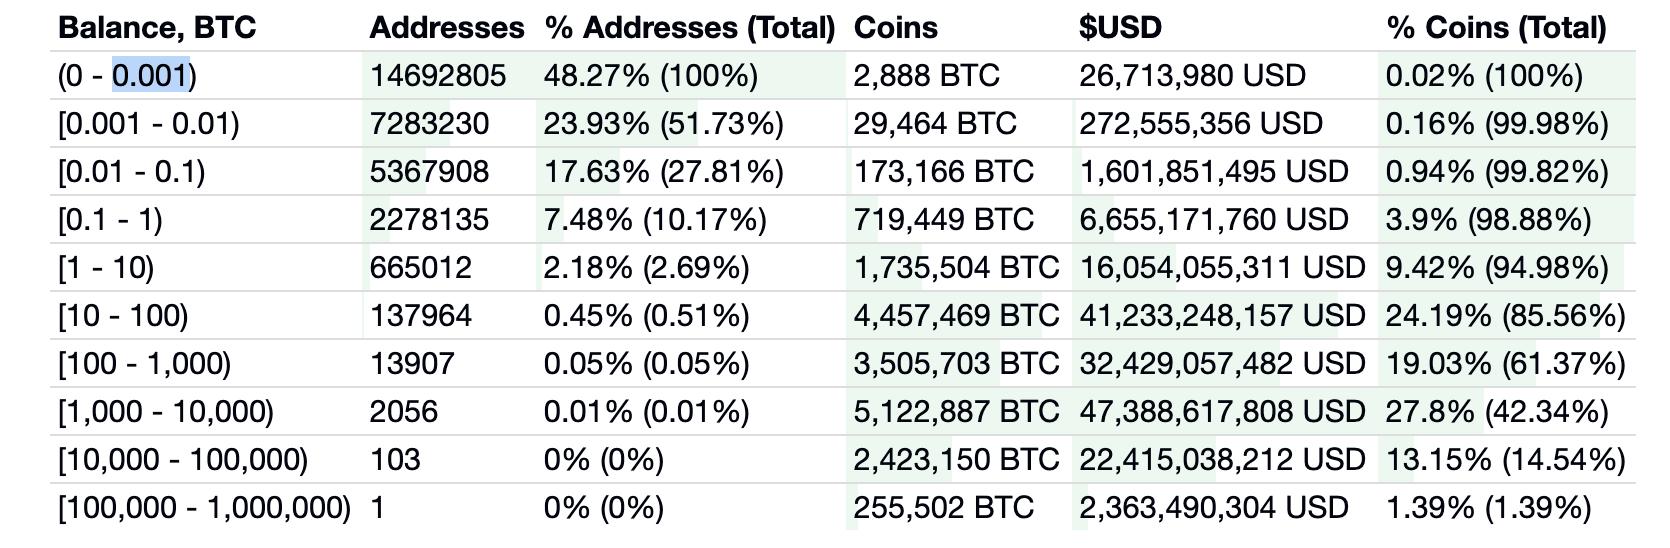 Bitcoin distribution, July 2020